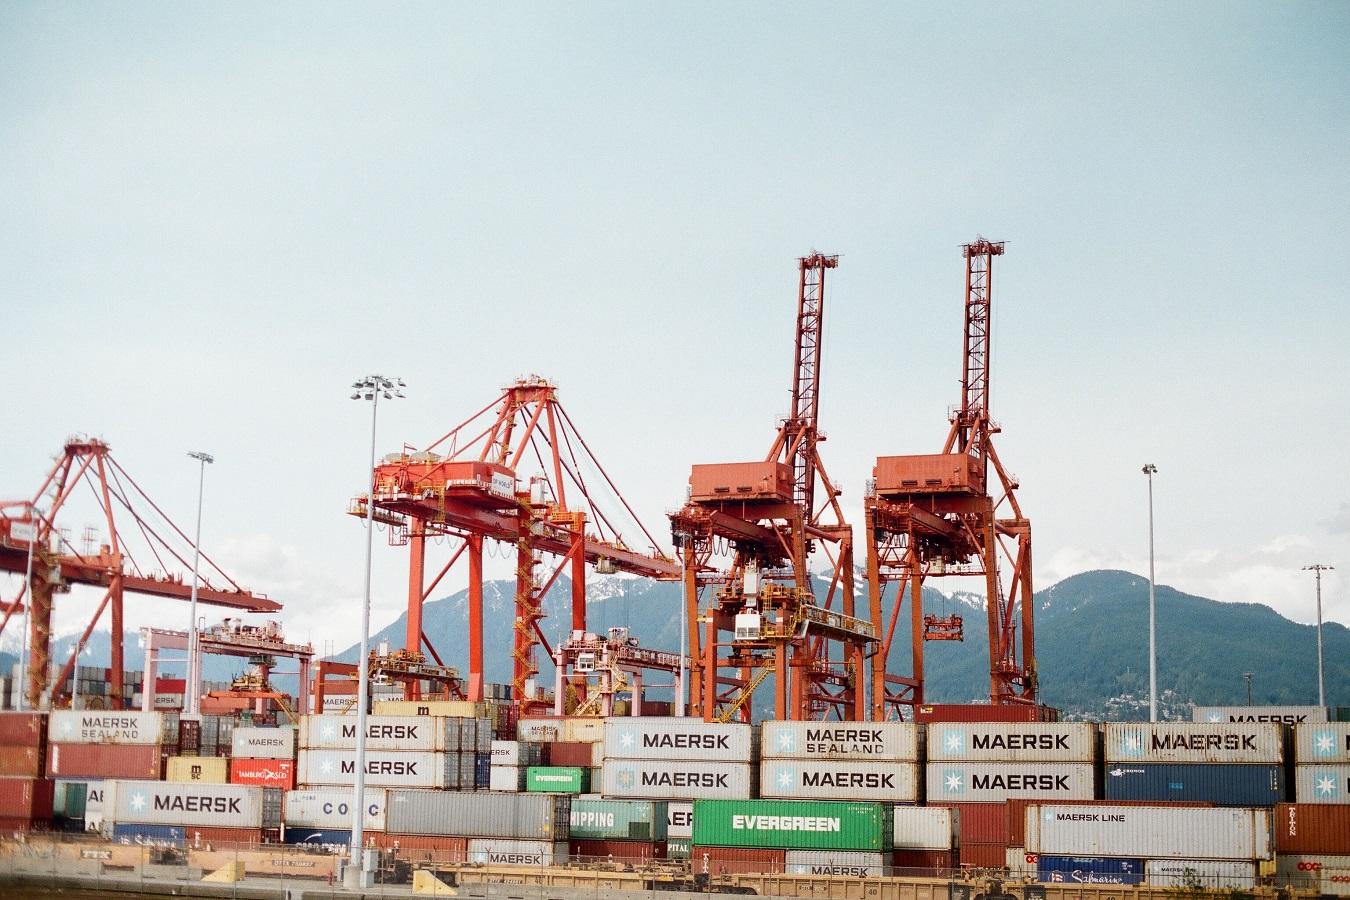 Chinese exports hasten as U.S. sets new tariffs in fierce dispute